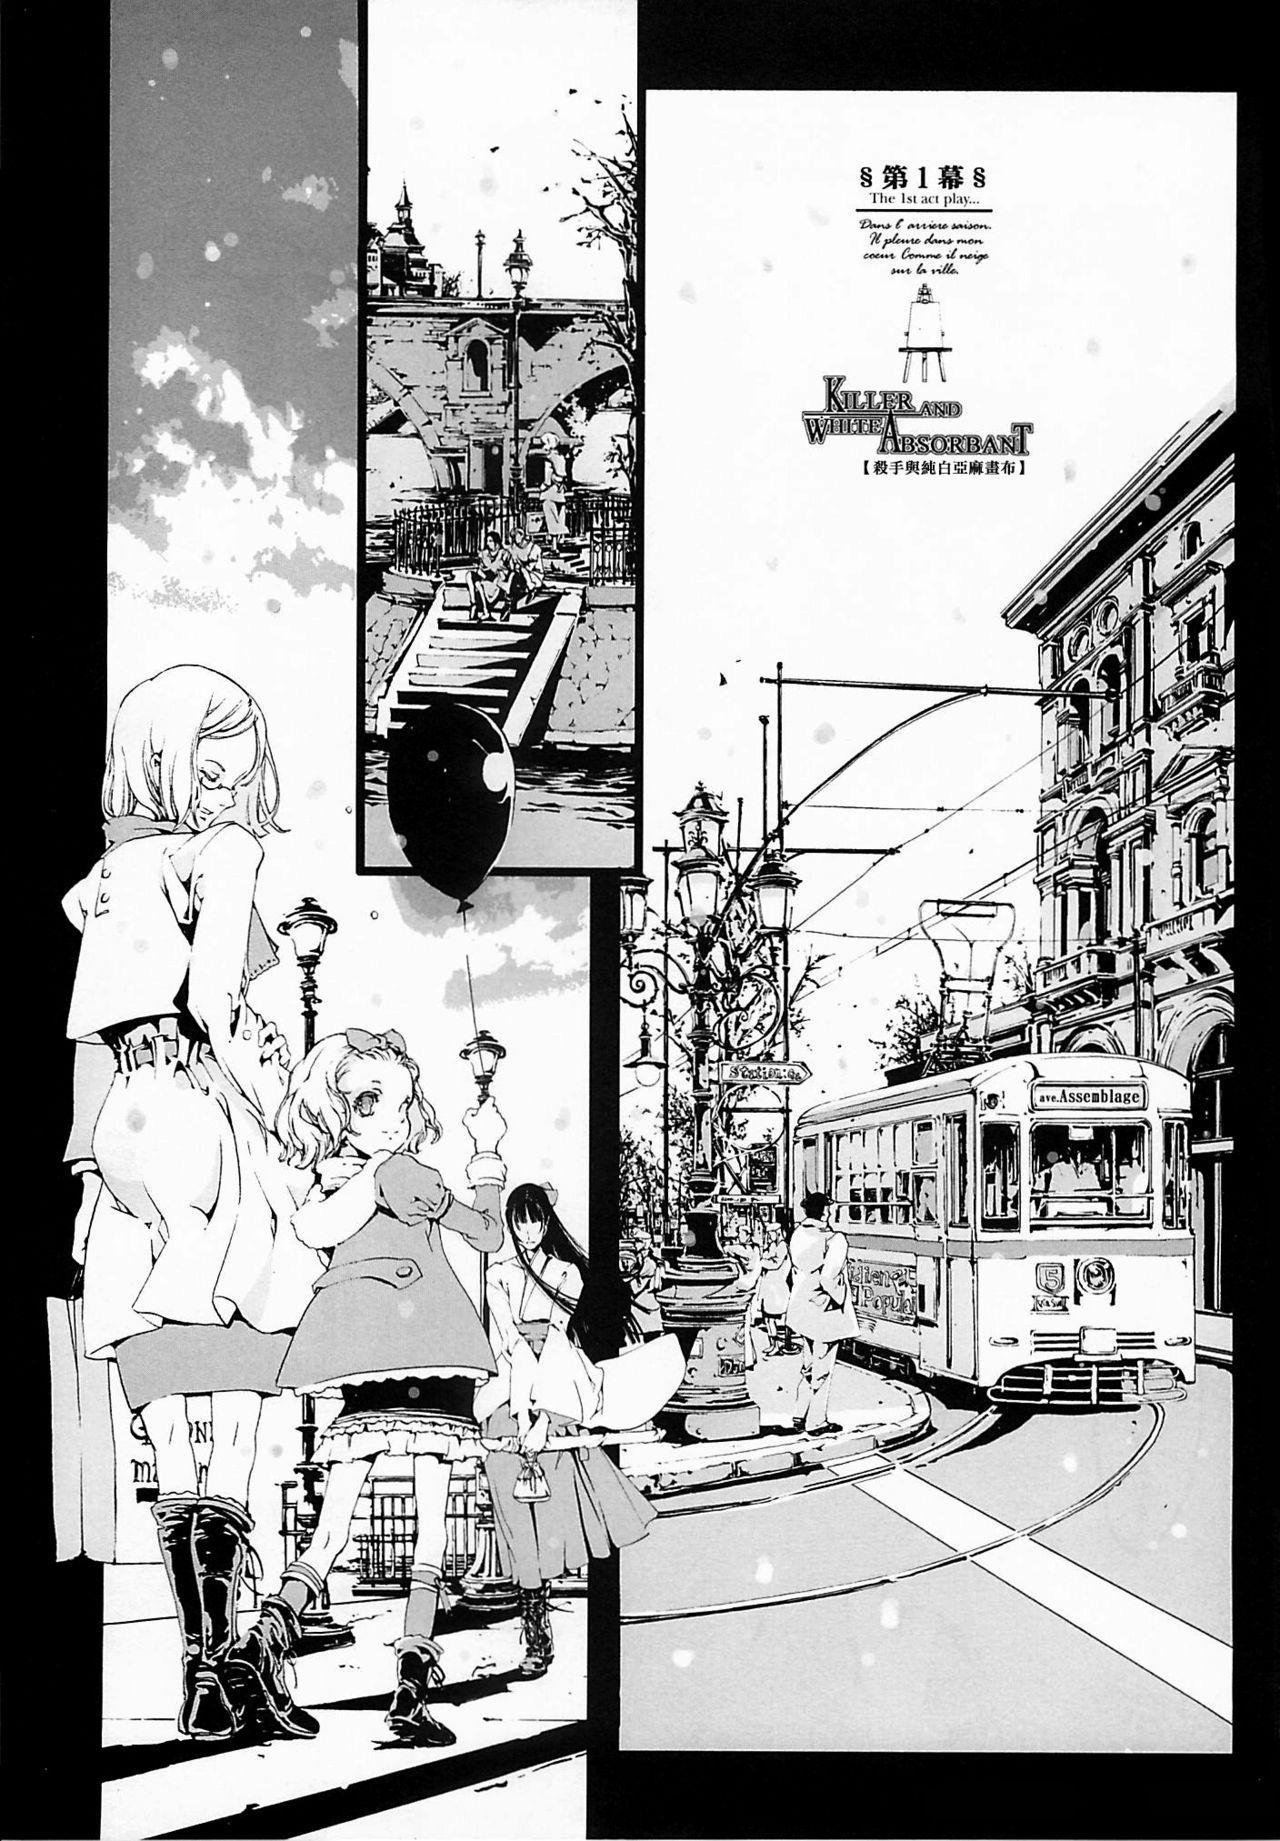 (CR37) [70 Nenshiki Yuukyuu Kikan (Endou Okito)] ORGAN-Tino  01-02[Chinese] [拾荒者汉化组] [Incomplete] 11